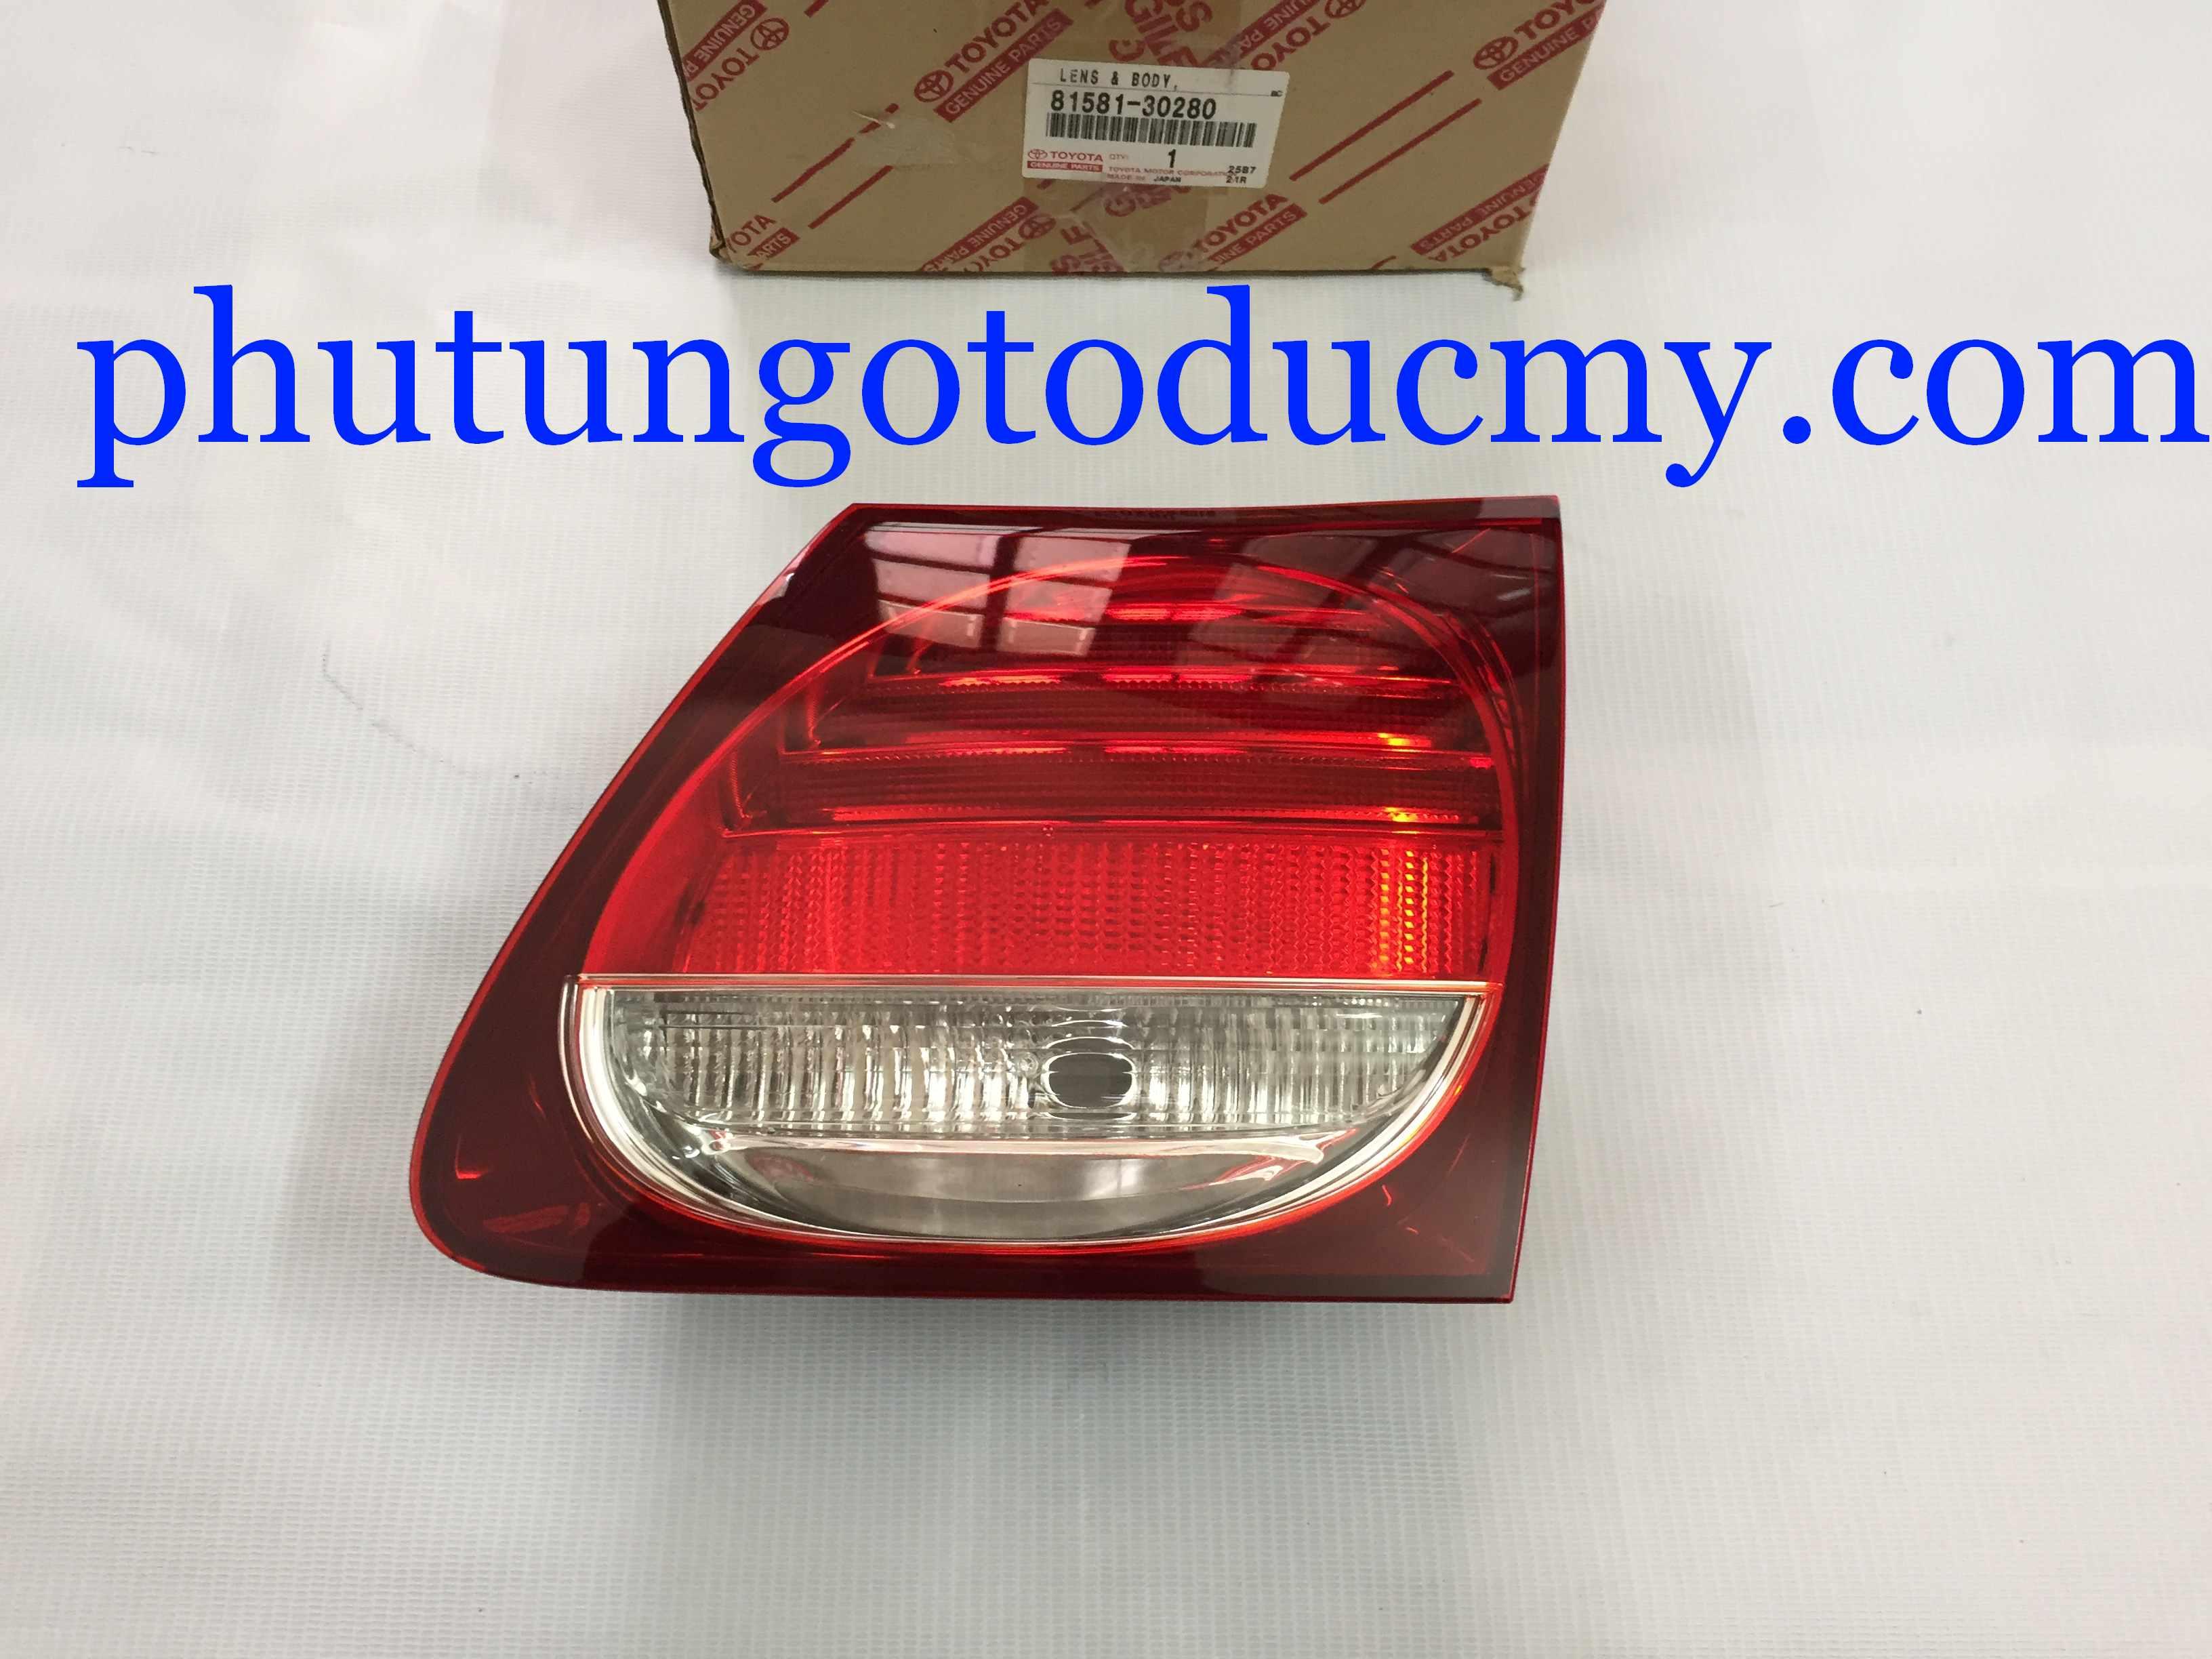 Đèn hậu Lexus GS300/350 ,81581-30280